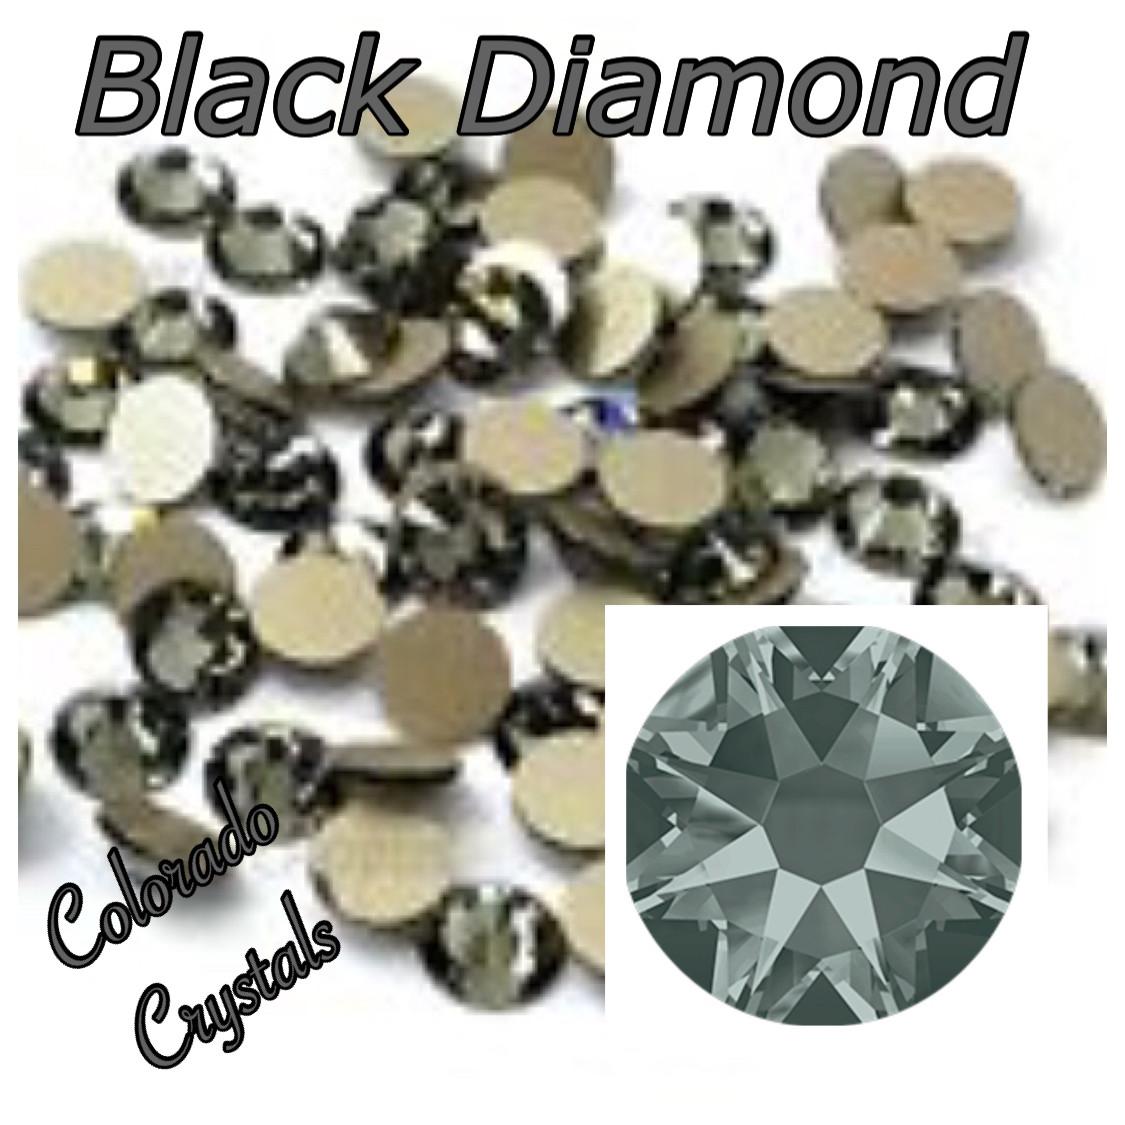 Black Diamond 16ss 2088 Limited Swarovski Flat back